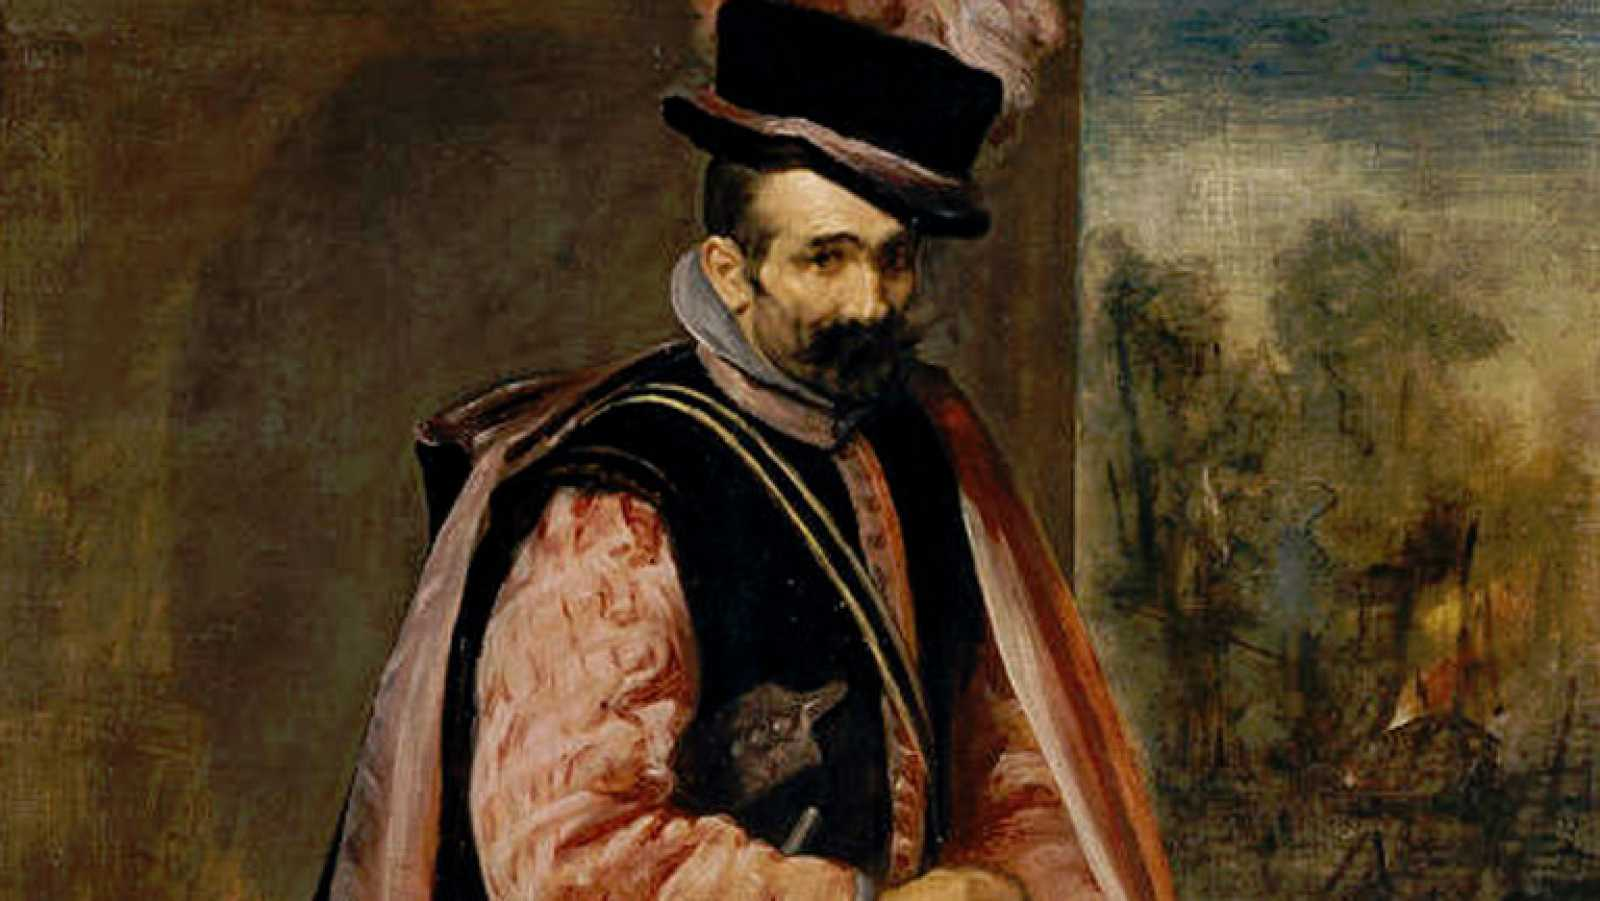 Mirar un cuadro - El bufón don Juan de Austria (Velázquez)